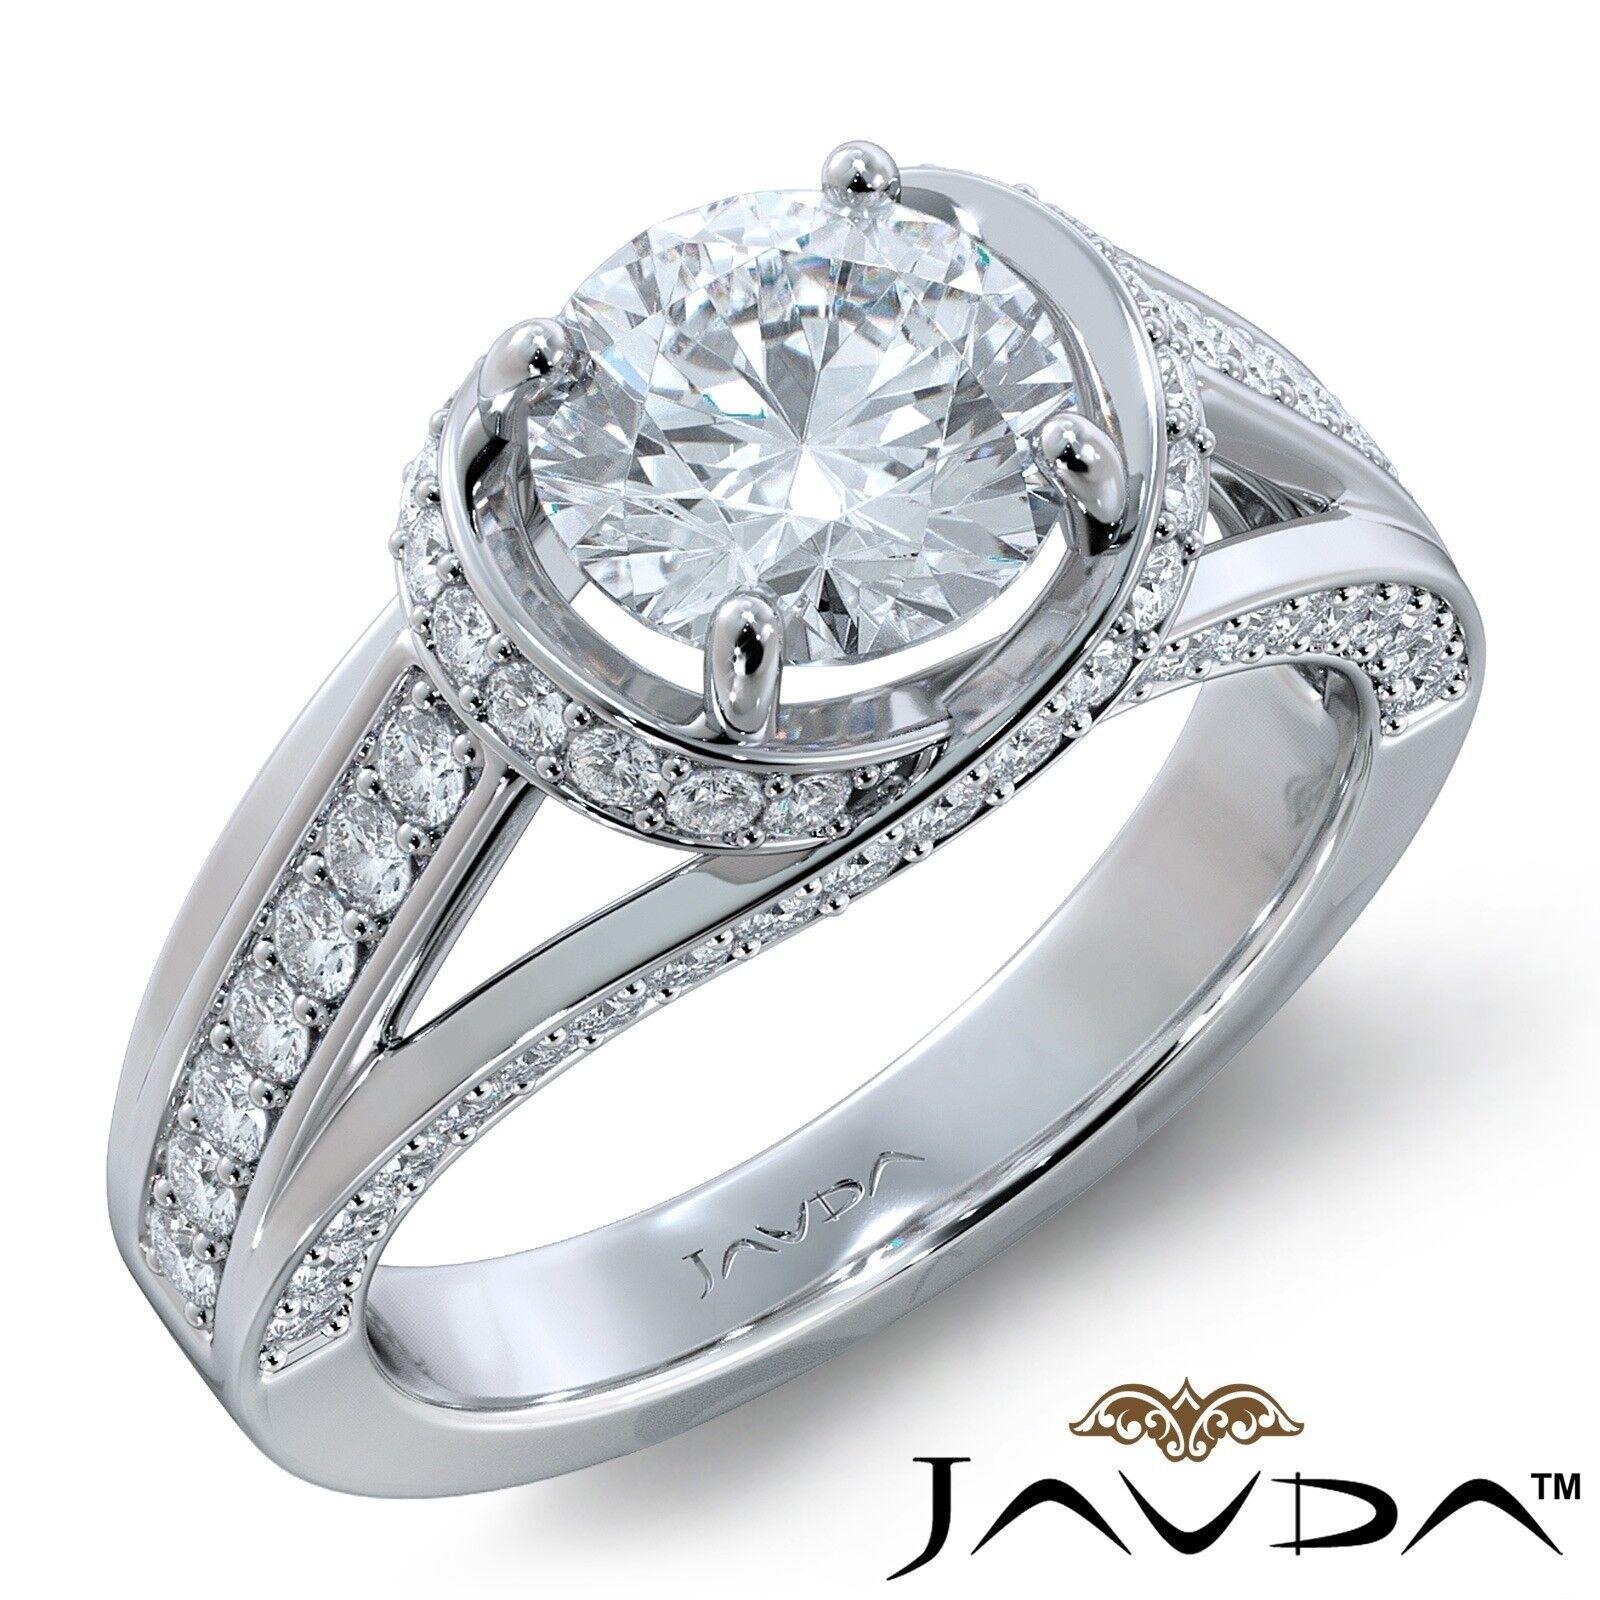 3.9ctw Knot Classic Sidestone Round Diamond Engagement Ring GIA I-SI1 White Gold